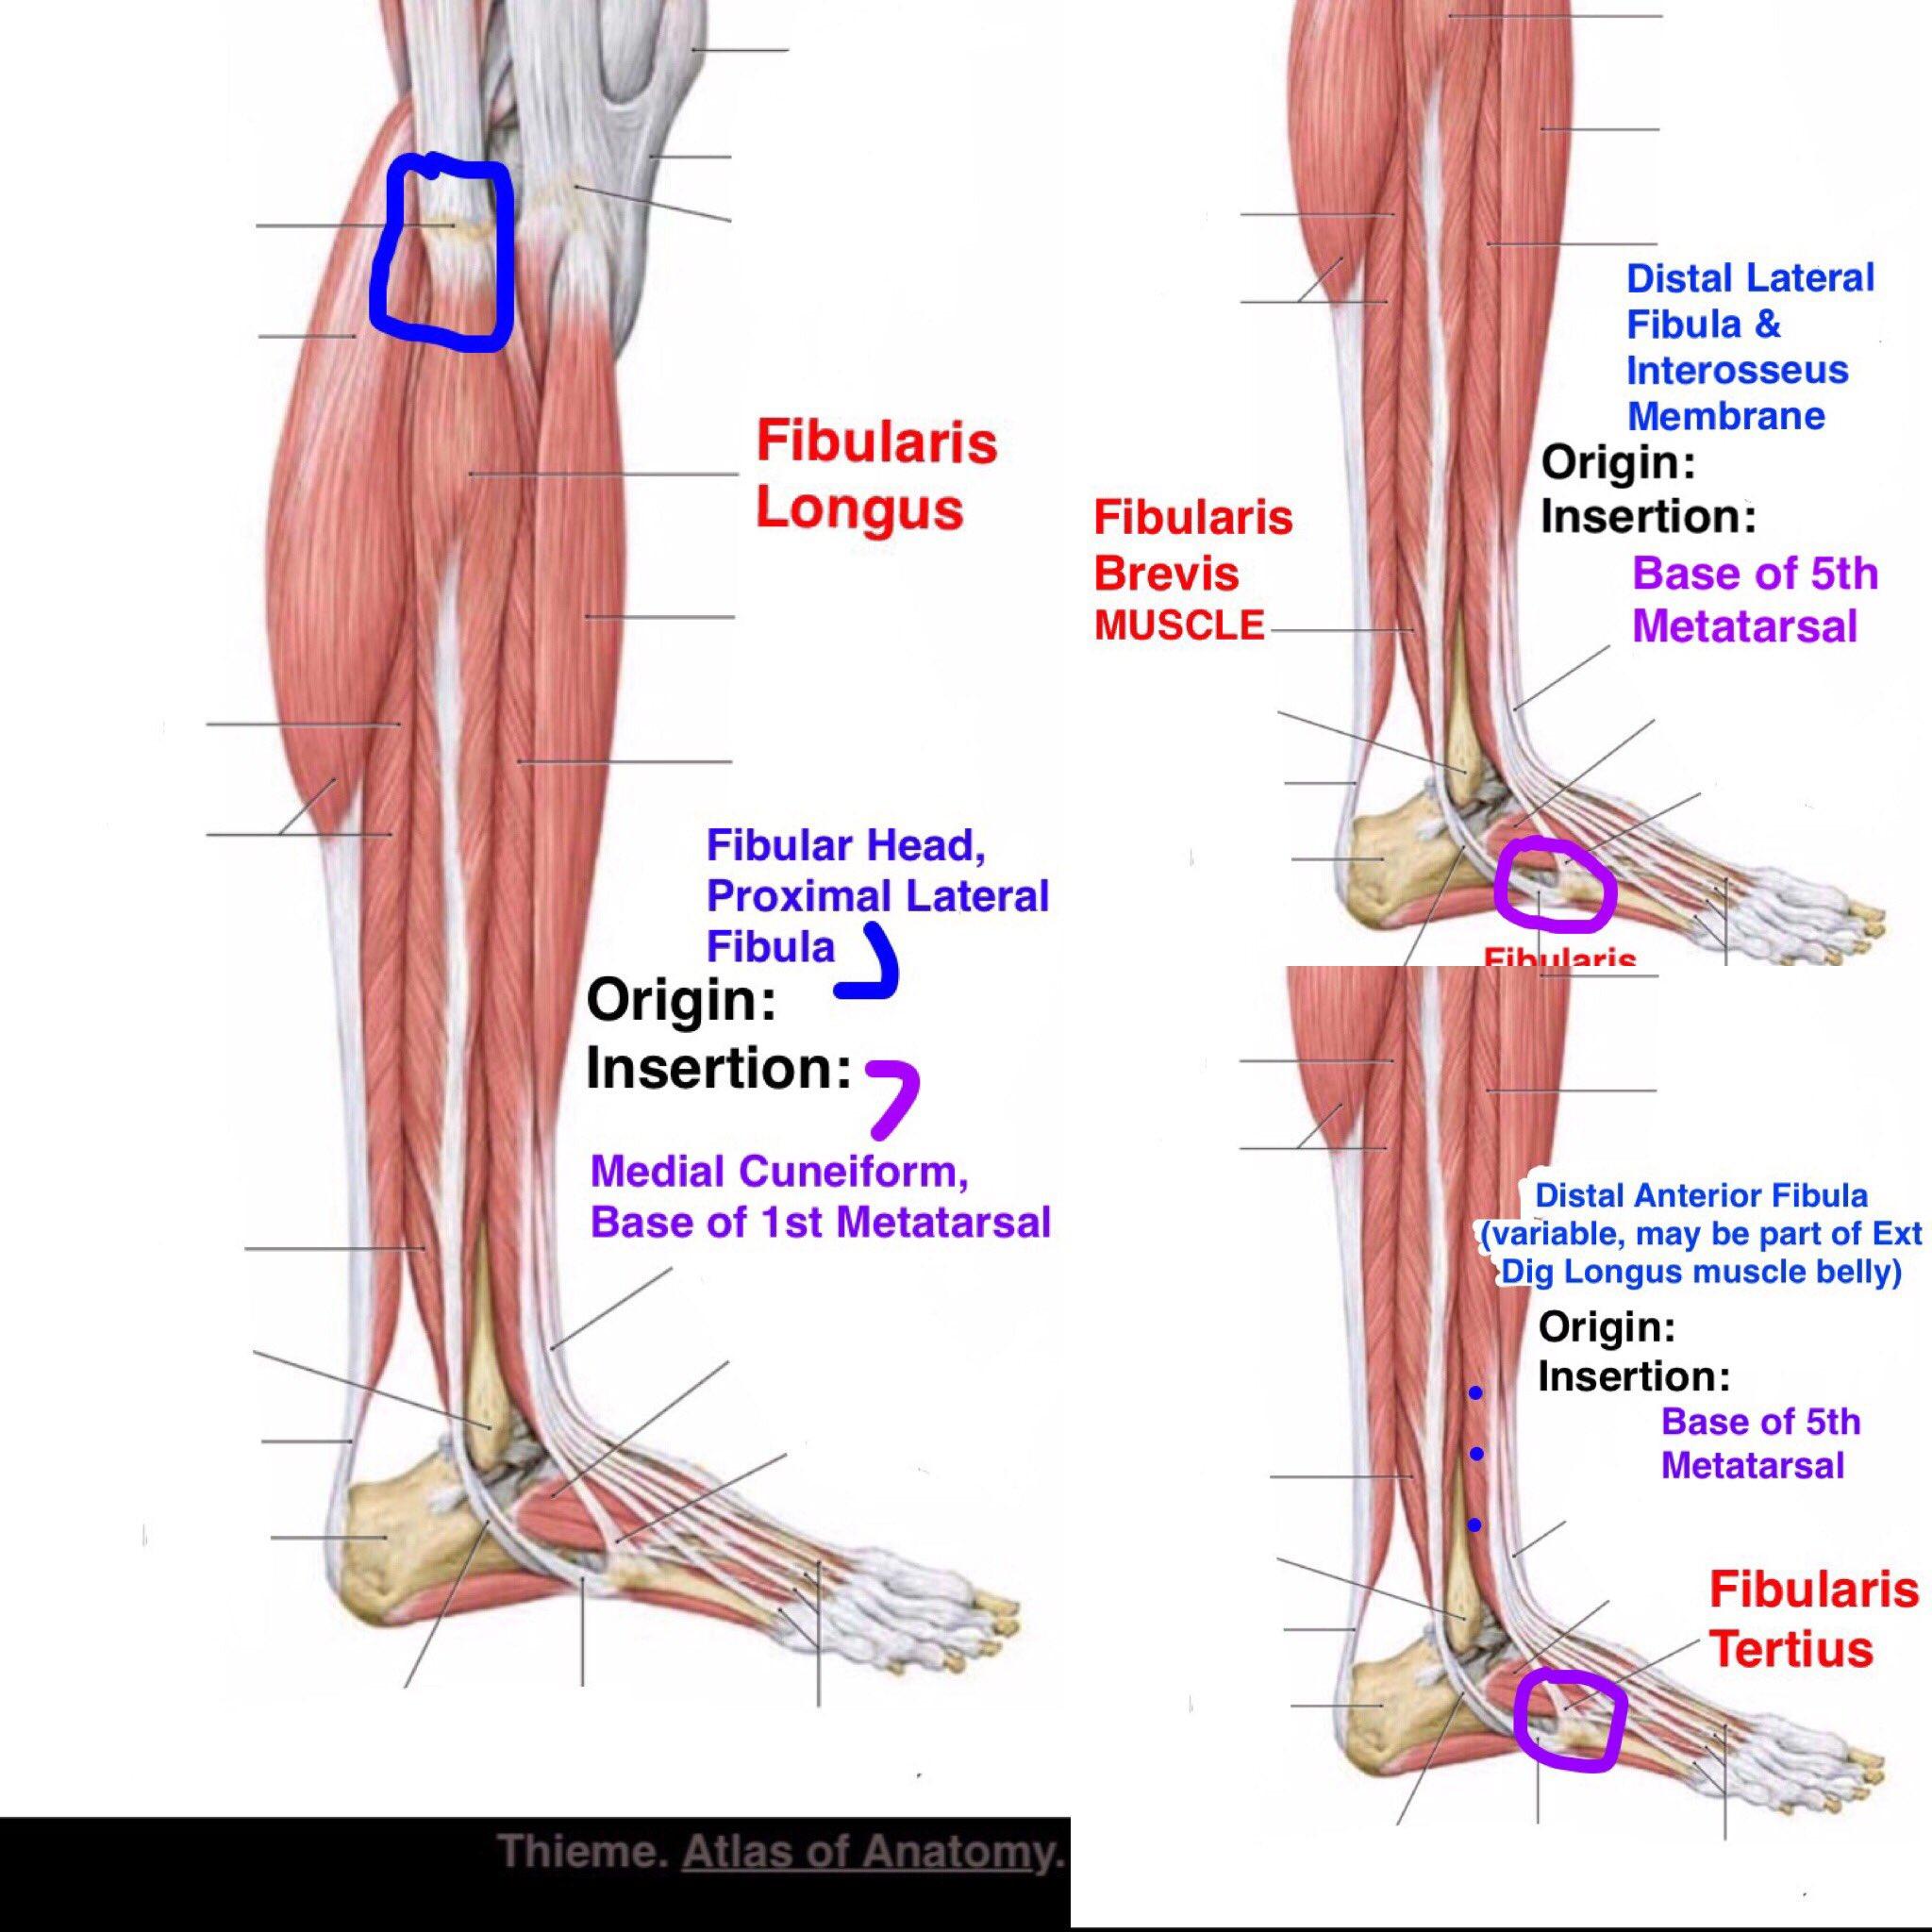 "SnapSPT 👻 on Twitter: ""#Fibularis Anatomy reviewed ..."